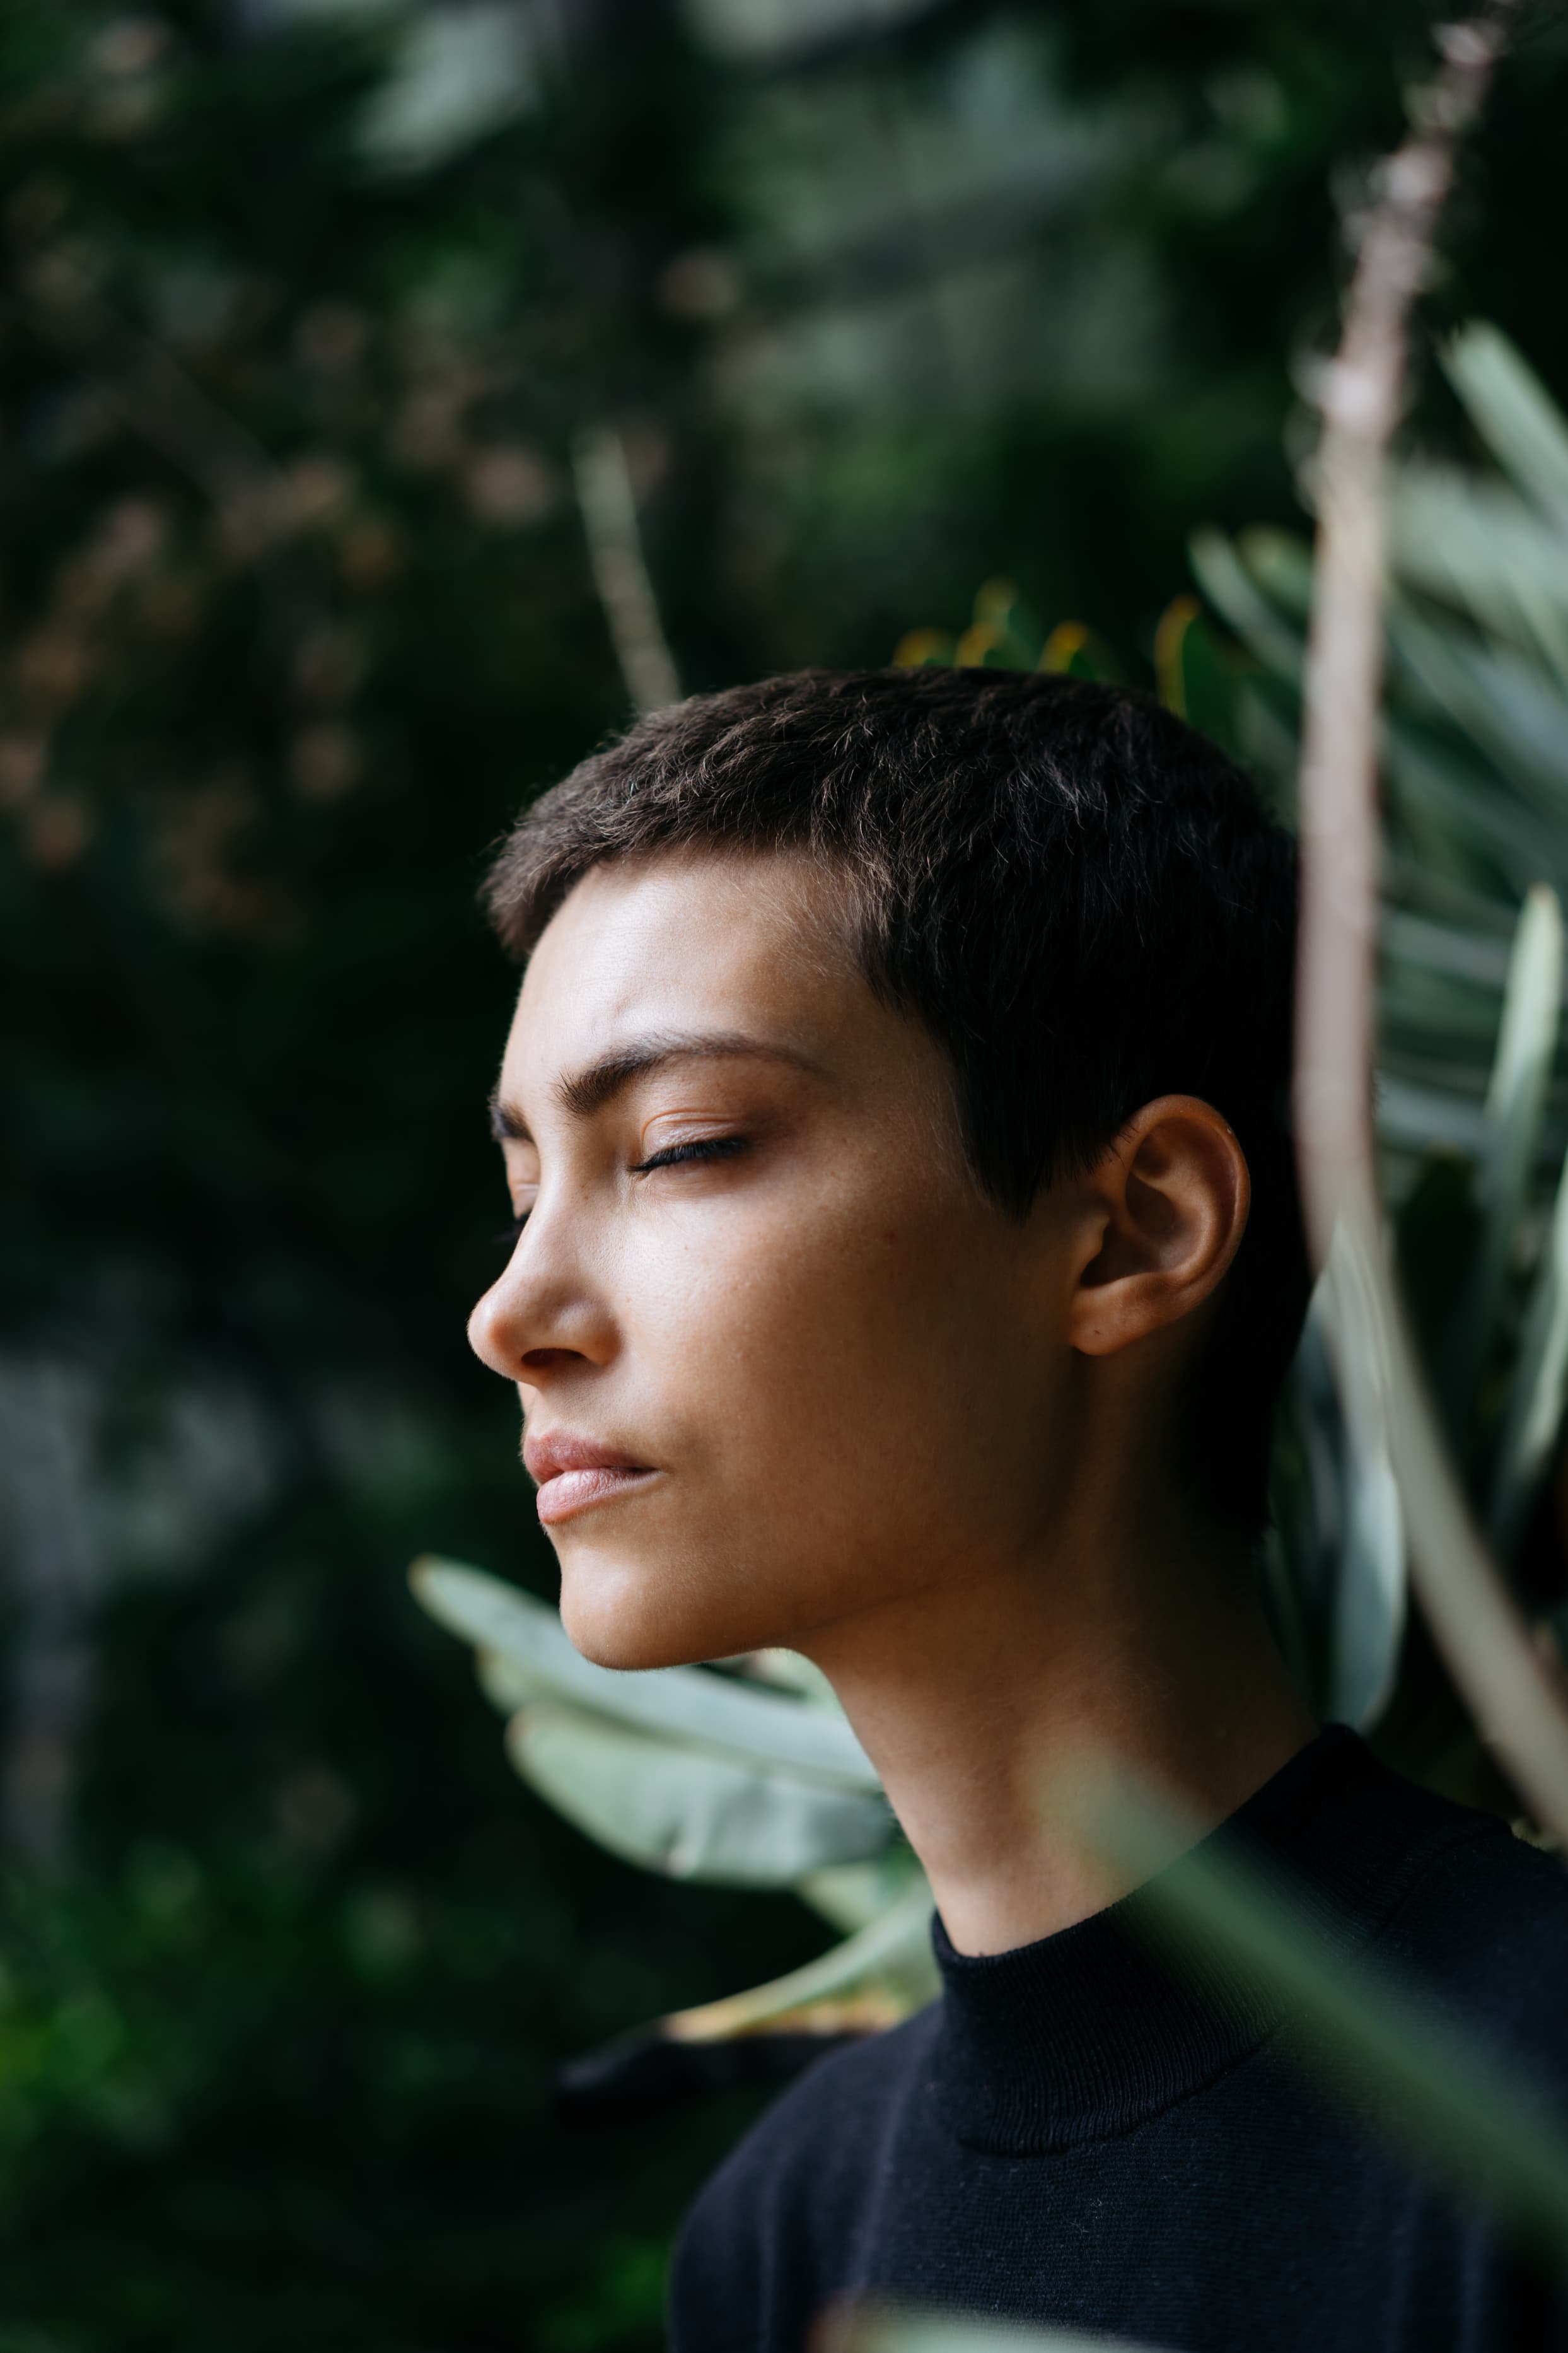 caen-meditation-olfactive-floriane-gilles-aromatherapie